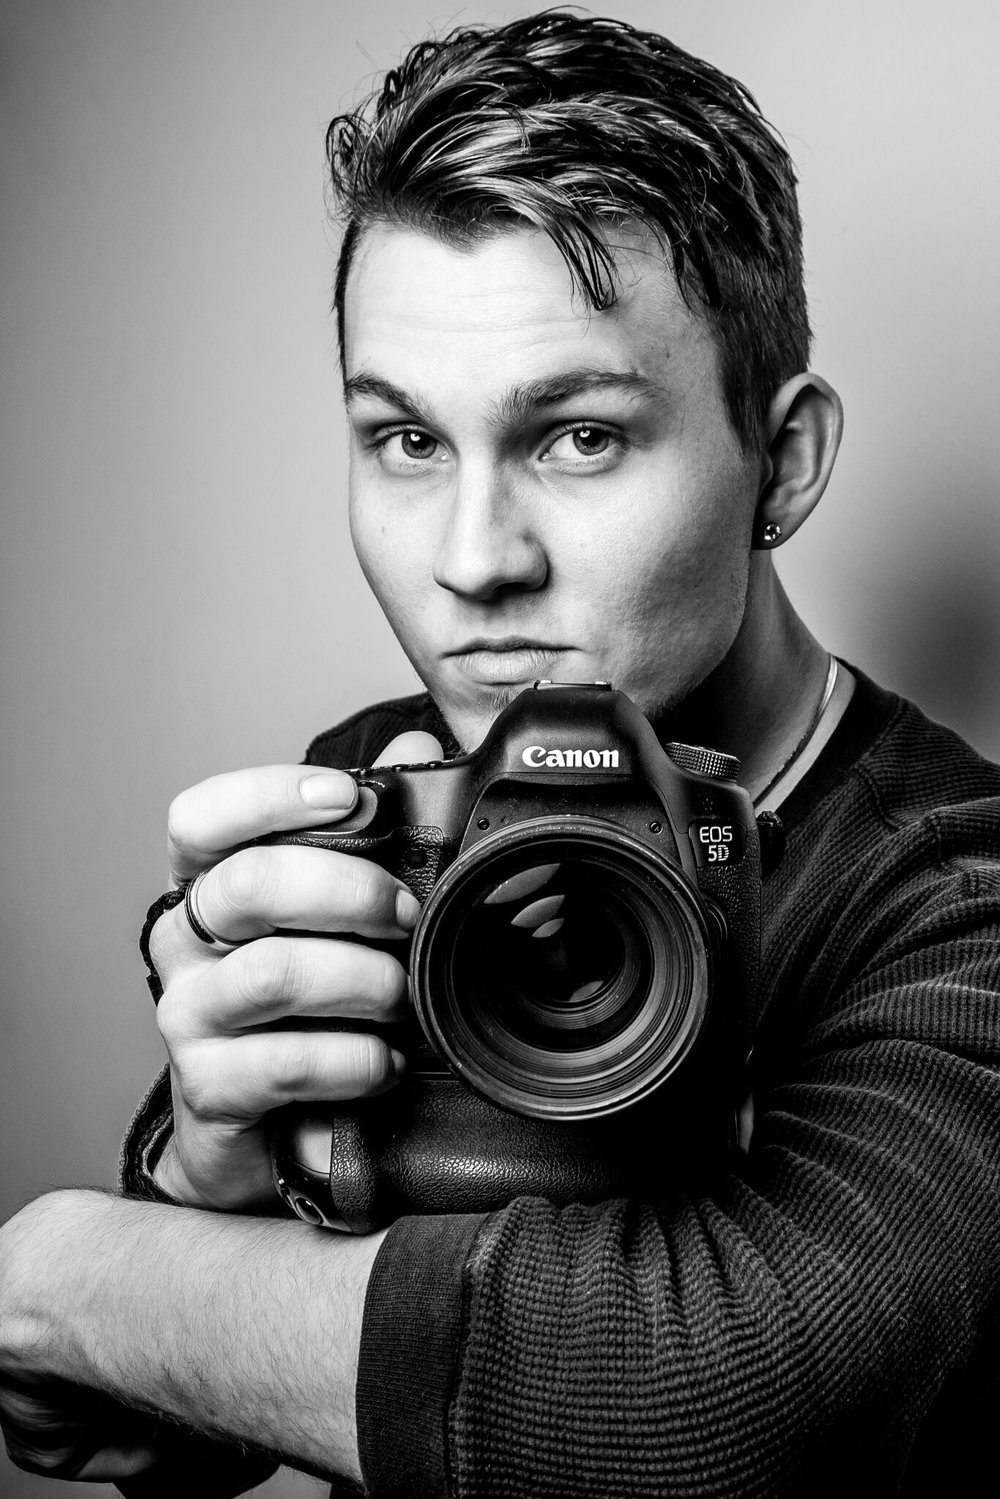 Josh portrait.jpg